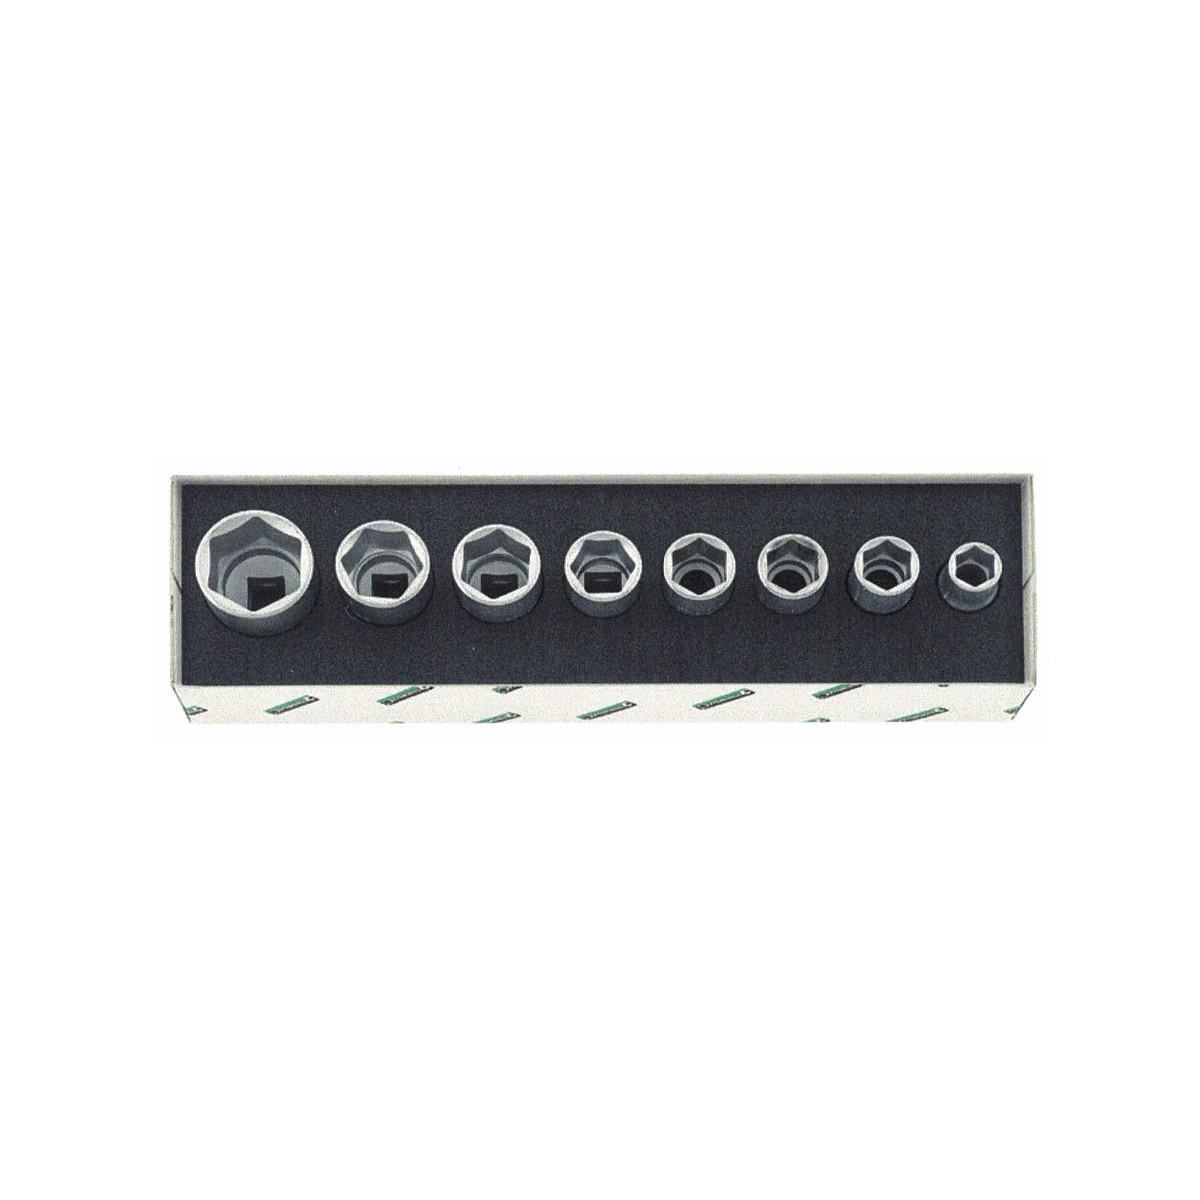 Stahlwille 96037708 Socket set 52/8, 8pcs.